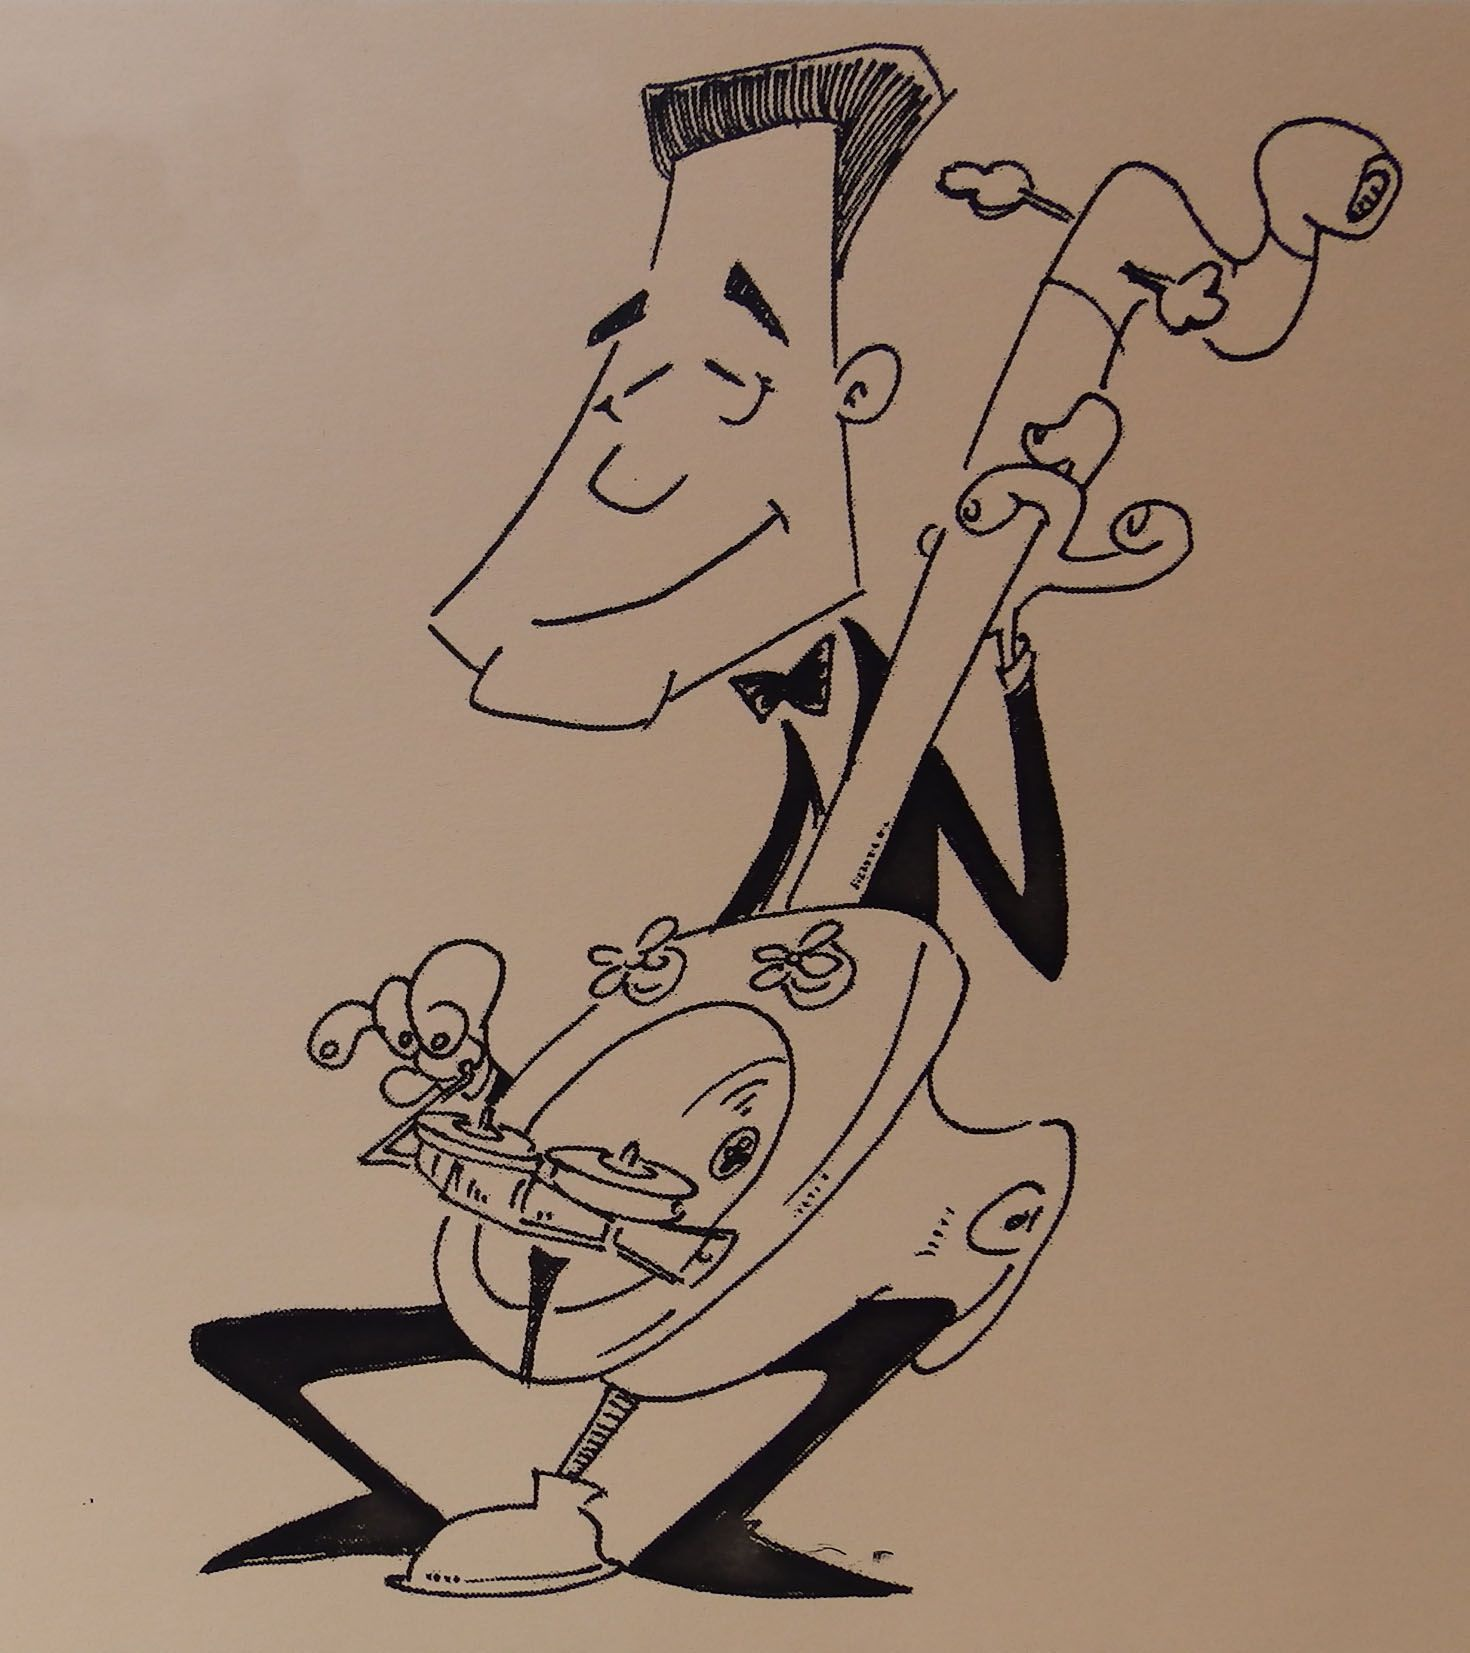 Les Luthiers - Maronna con nomeolbidet 2003